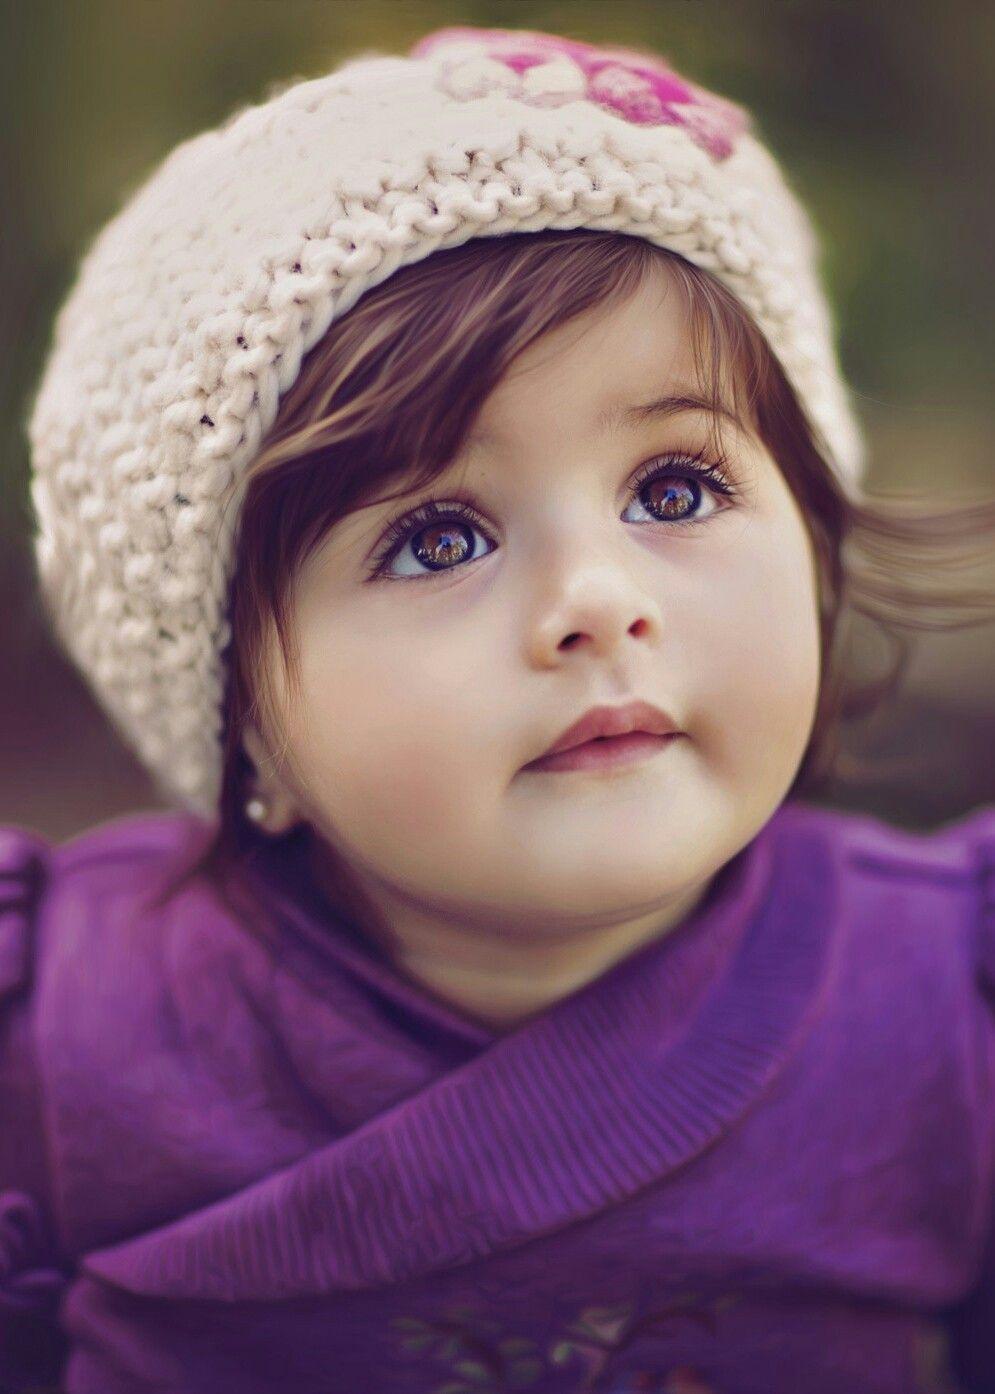 Simplemente Hermosa Cute Baby Wallpaper Cute Baby Girl Wallpaper Baby Girl Images